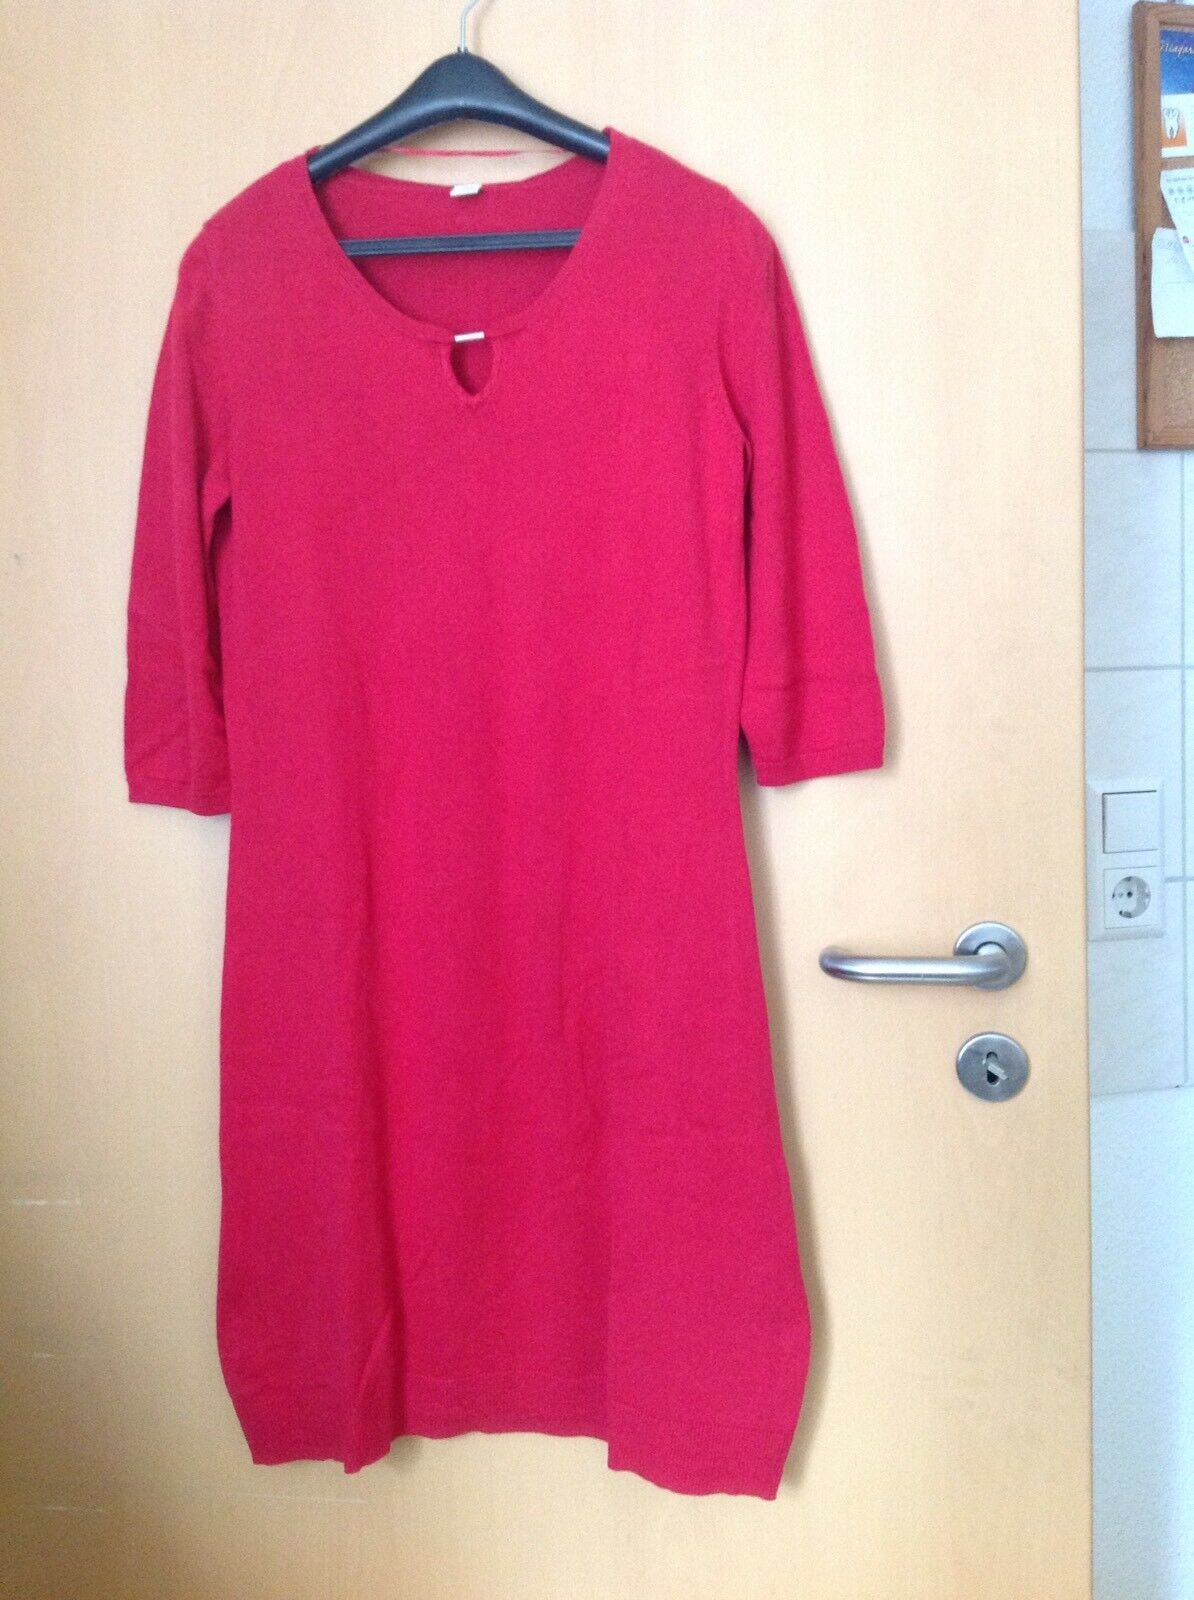 kleid strickkleid von s.oliver gr. 40, rot | ebay